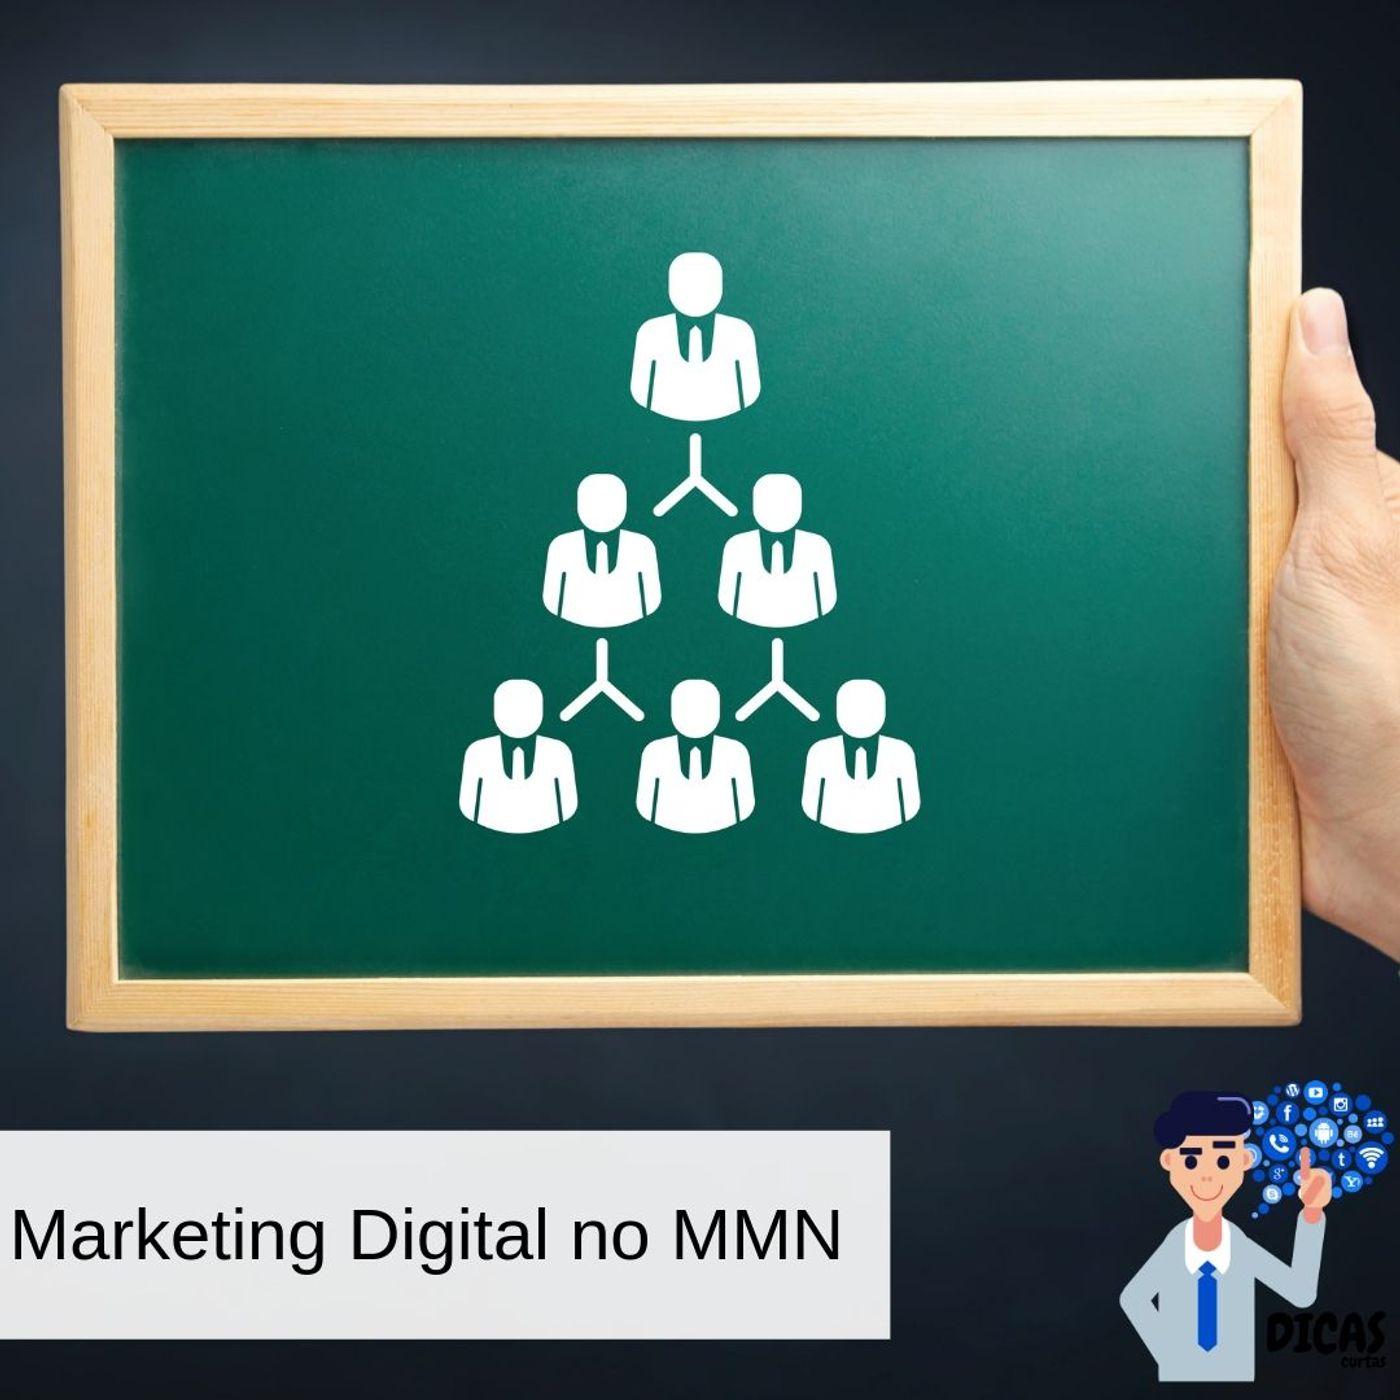 082 Marketing Digital no MMN